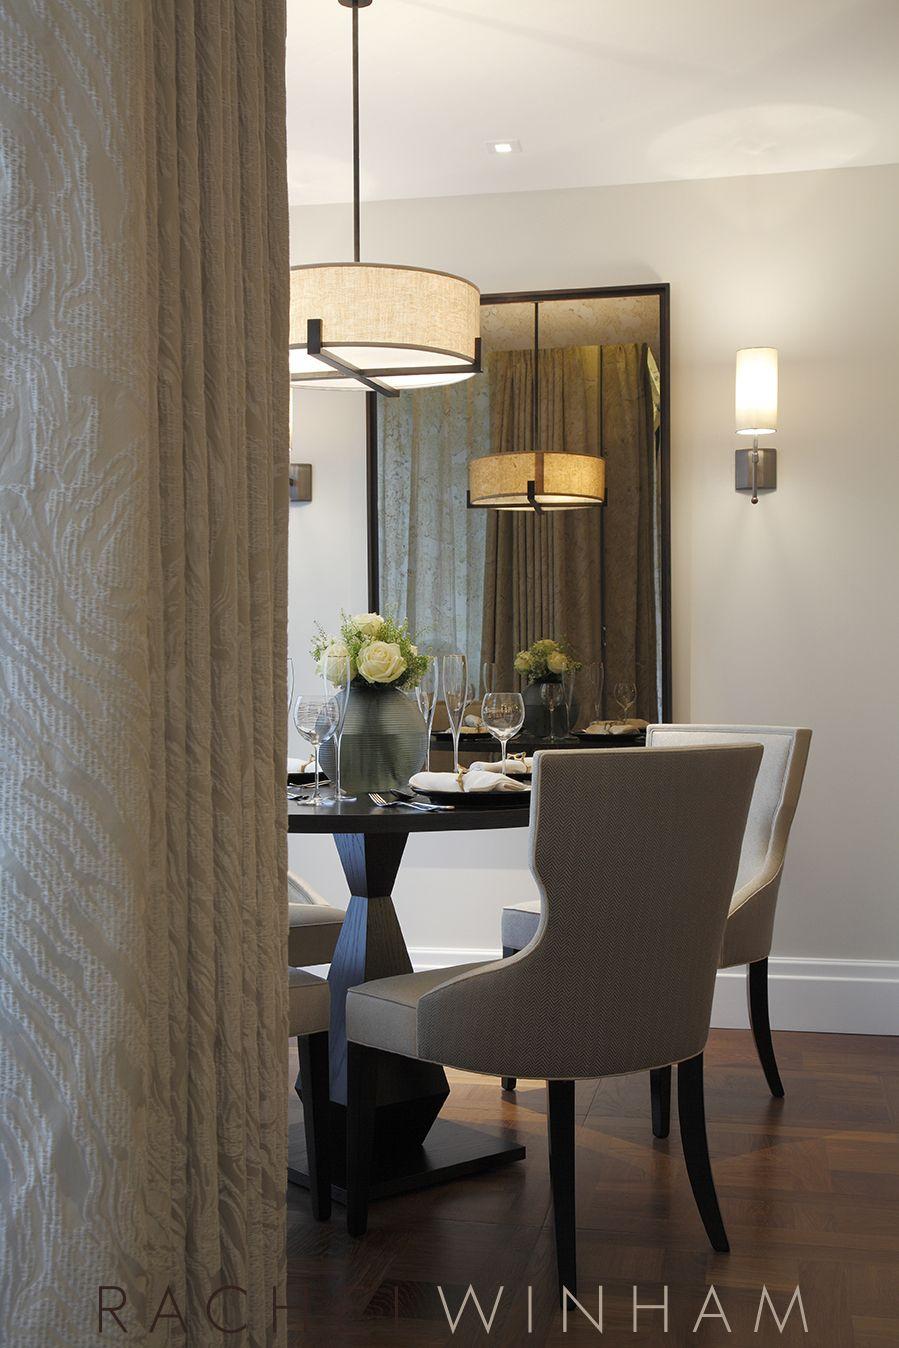 Kitchen Dining Interior Design: Rachel Winham Interior Design In 2019